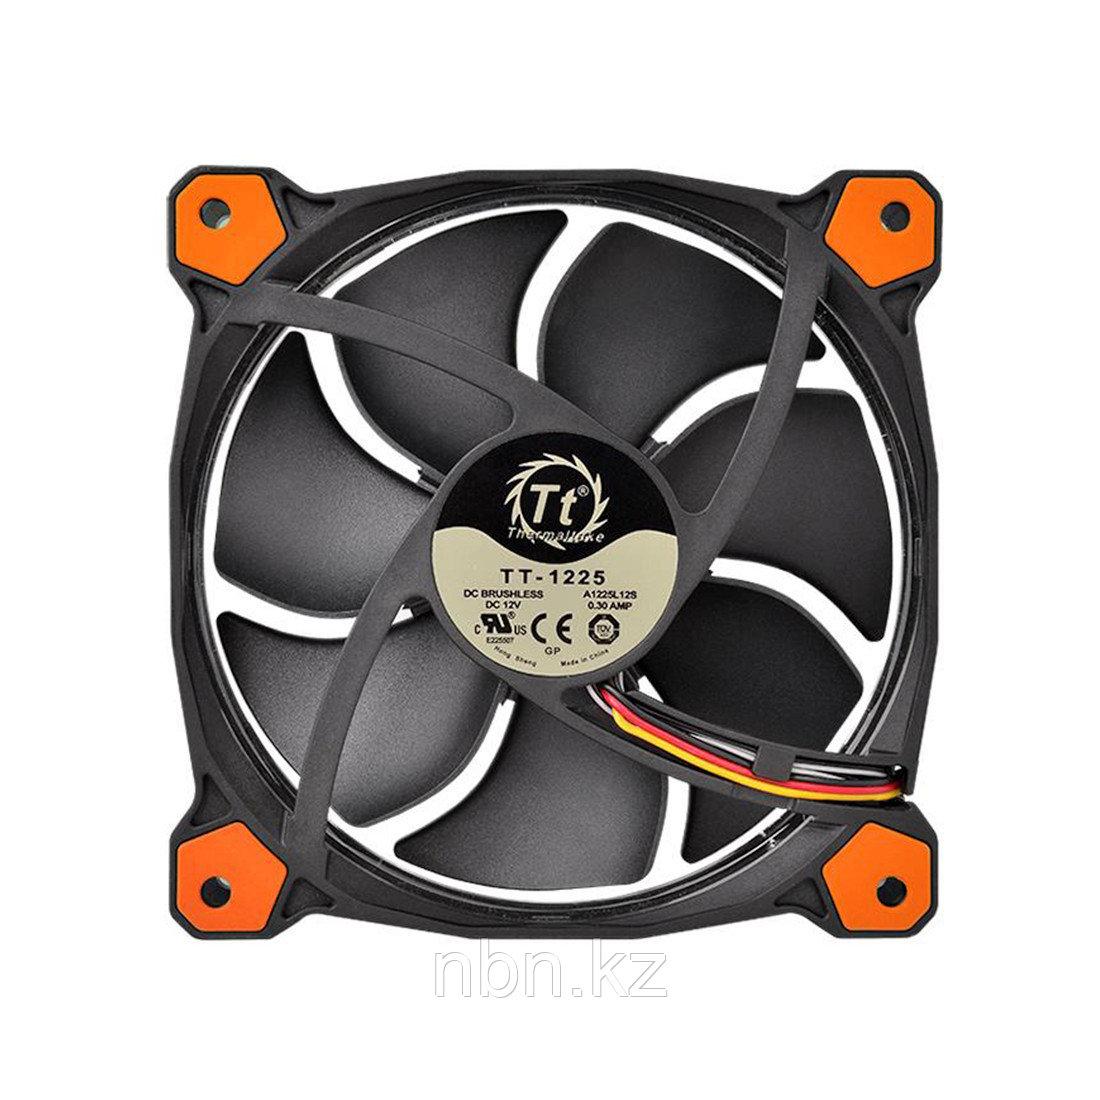 Кулер для компьютерного корпуса Thermaltake Riing 12 LED Orange